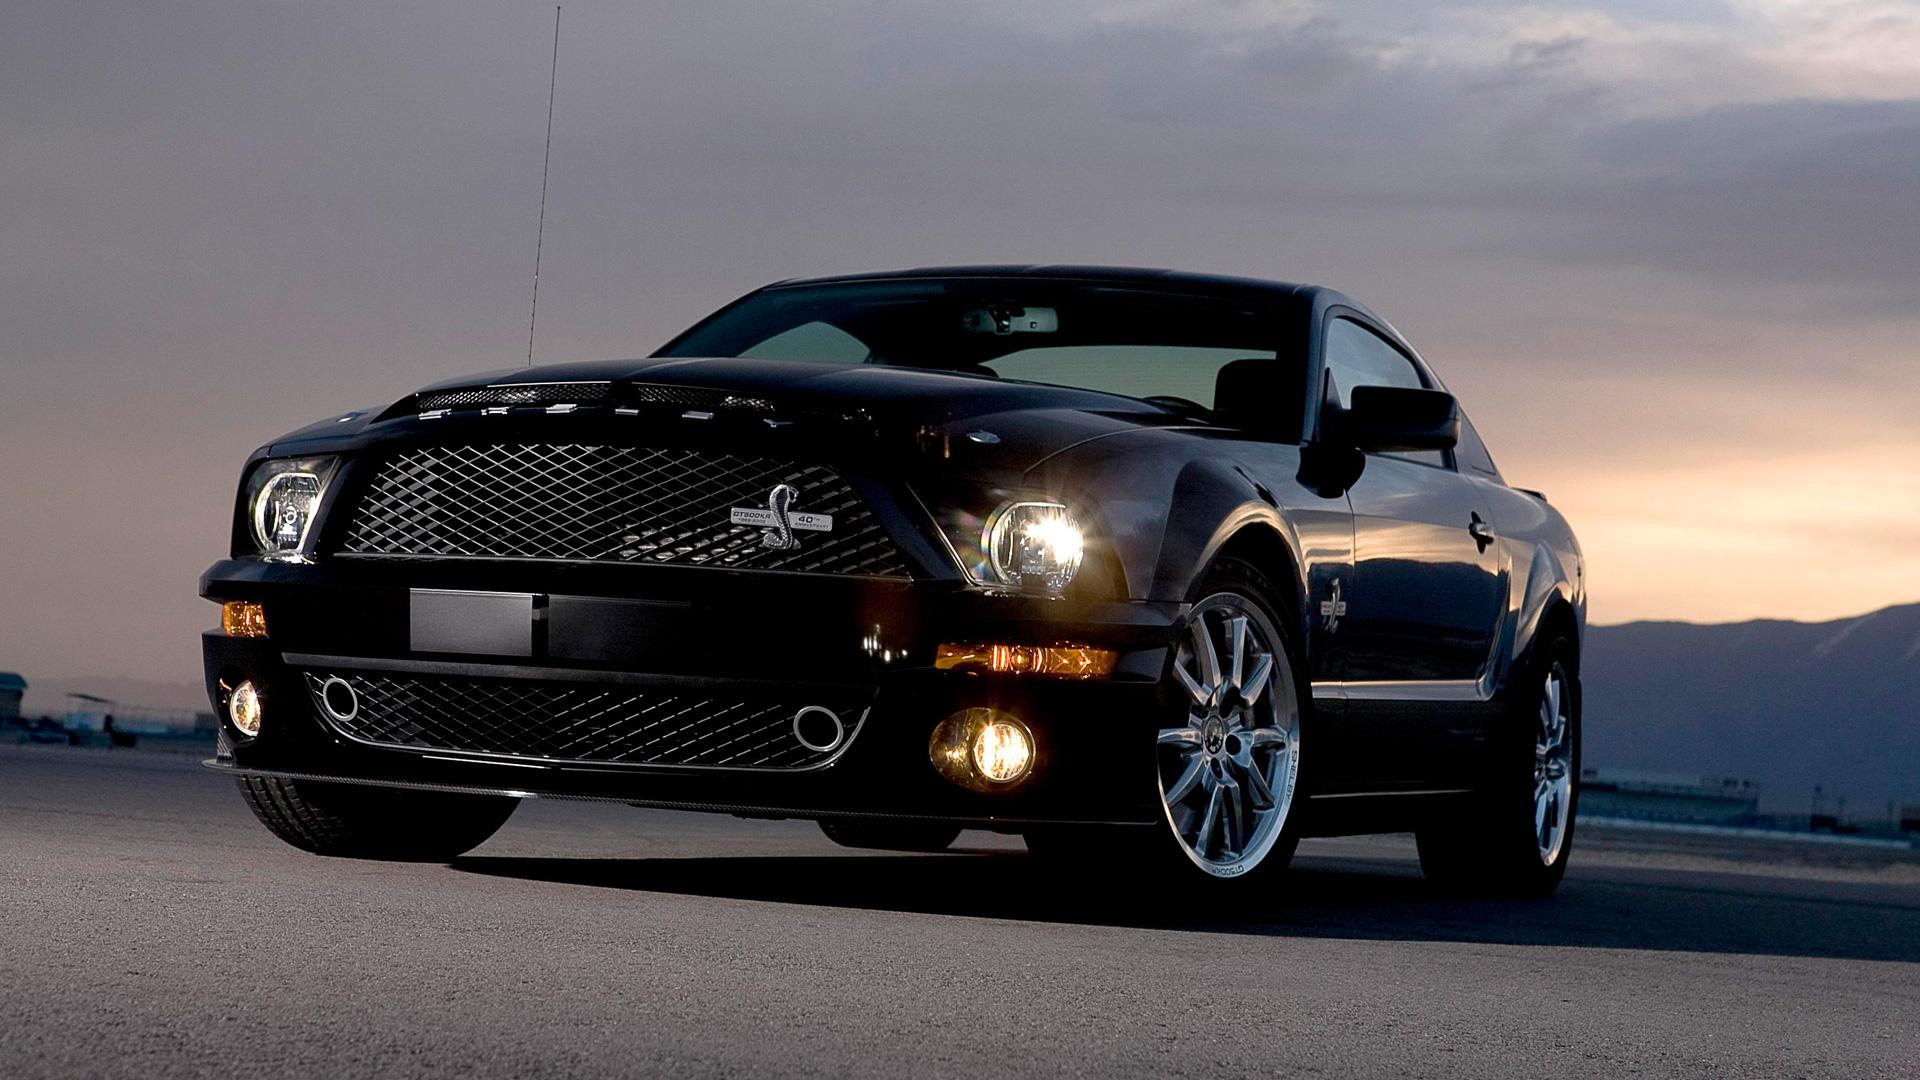 Shelby GT 500 Wallpapers  WallpaperSafari